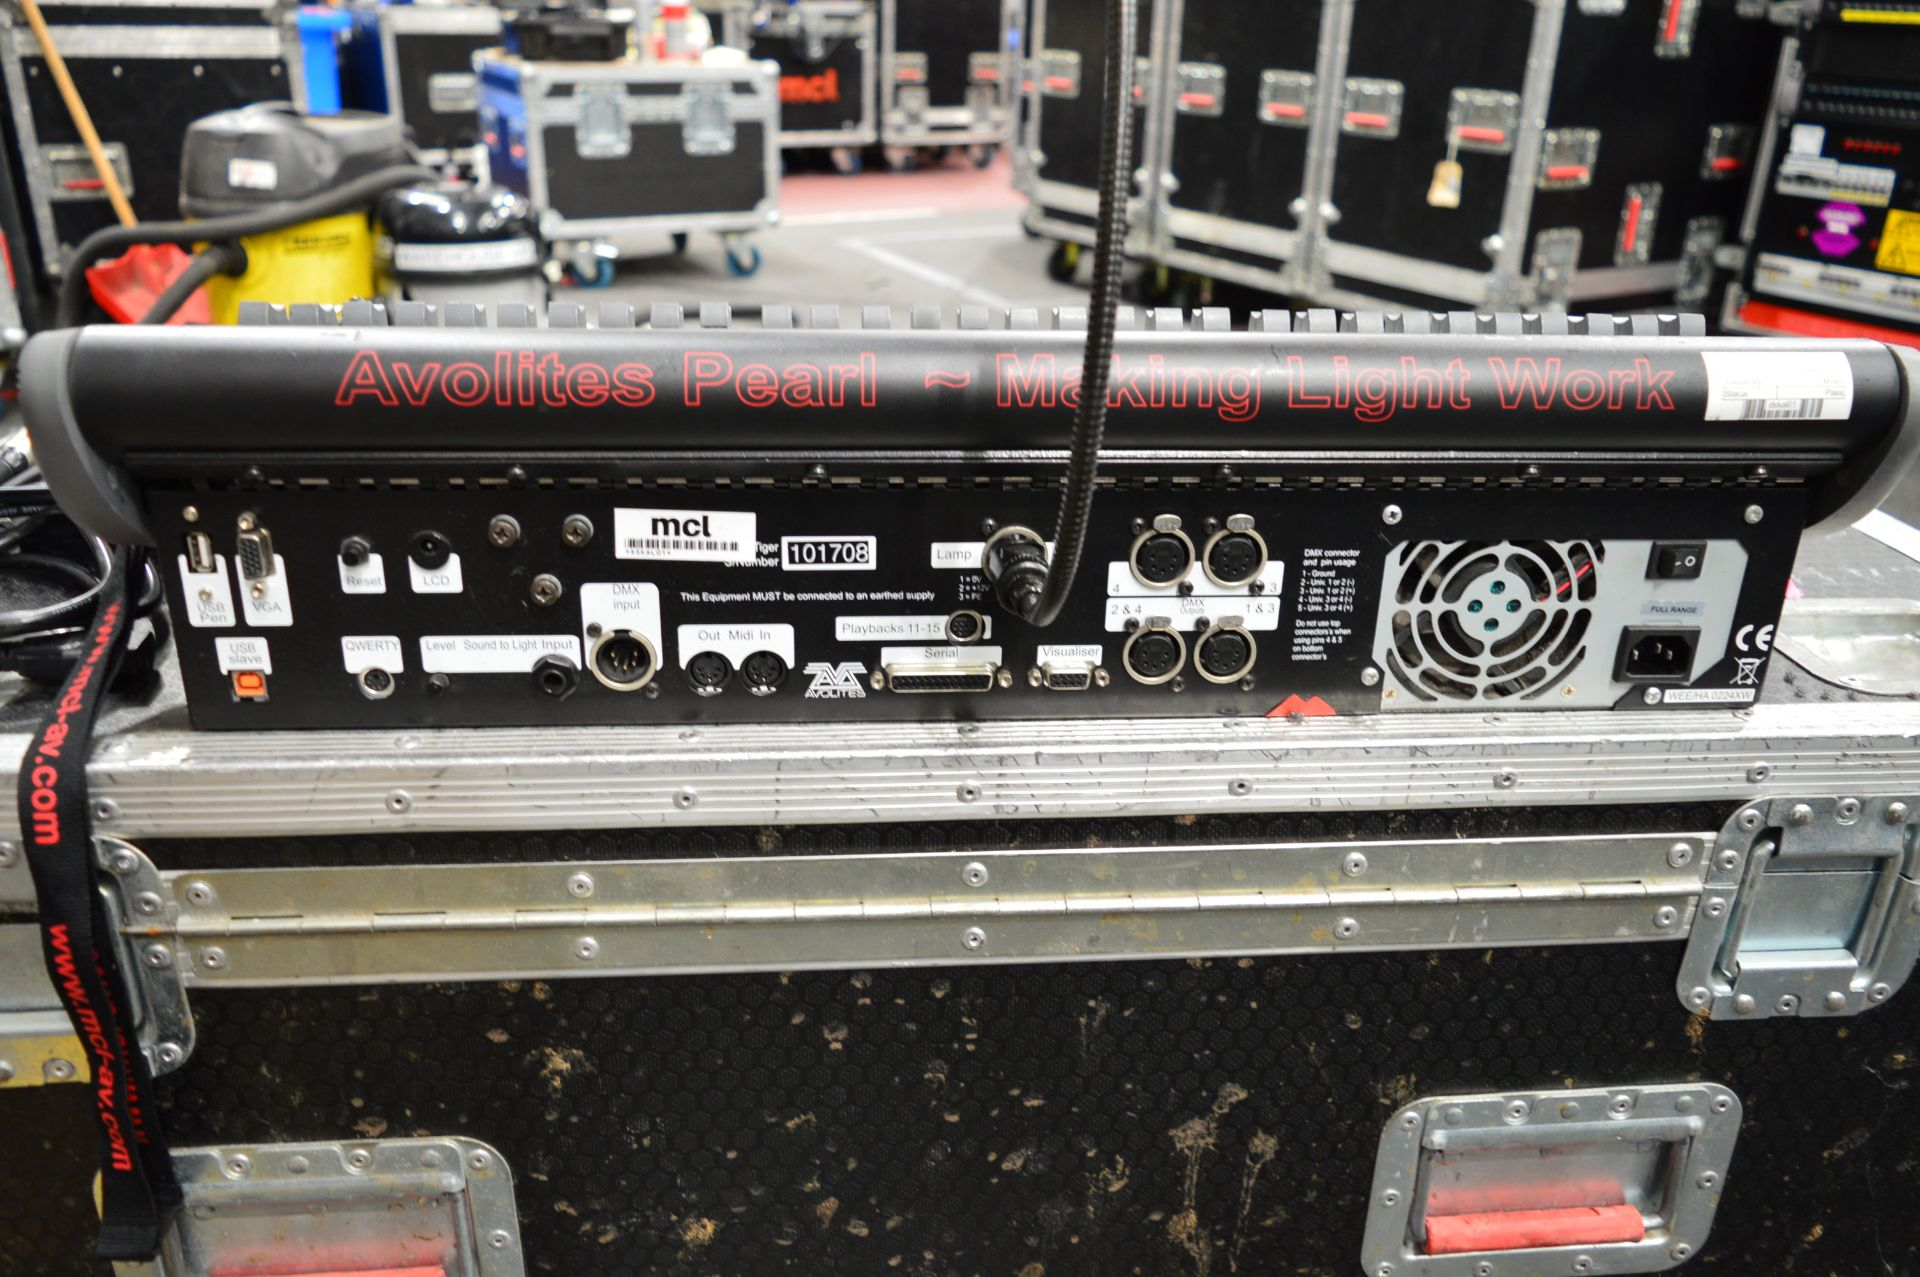 Lot 1036 - Avolites, Pear Tiger lighting console controller,